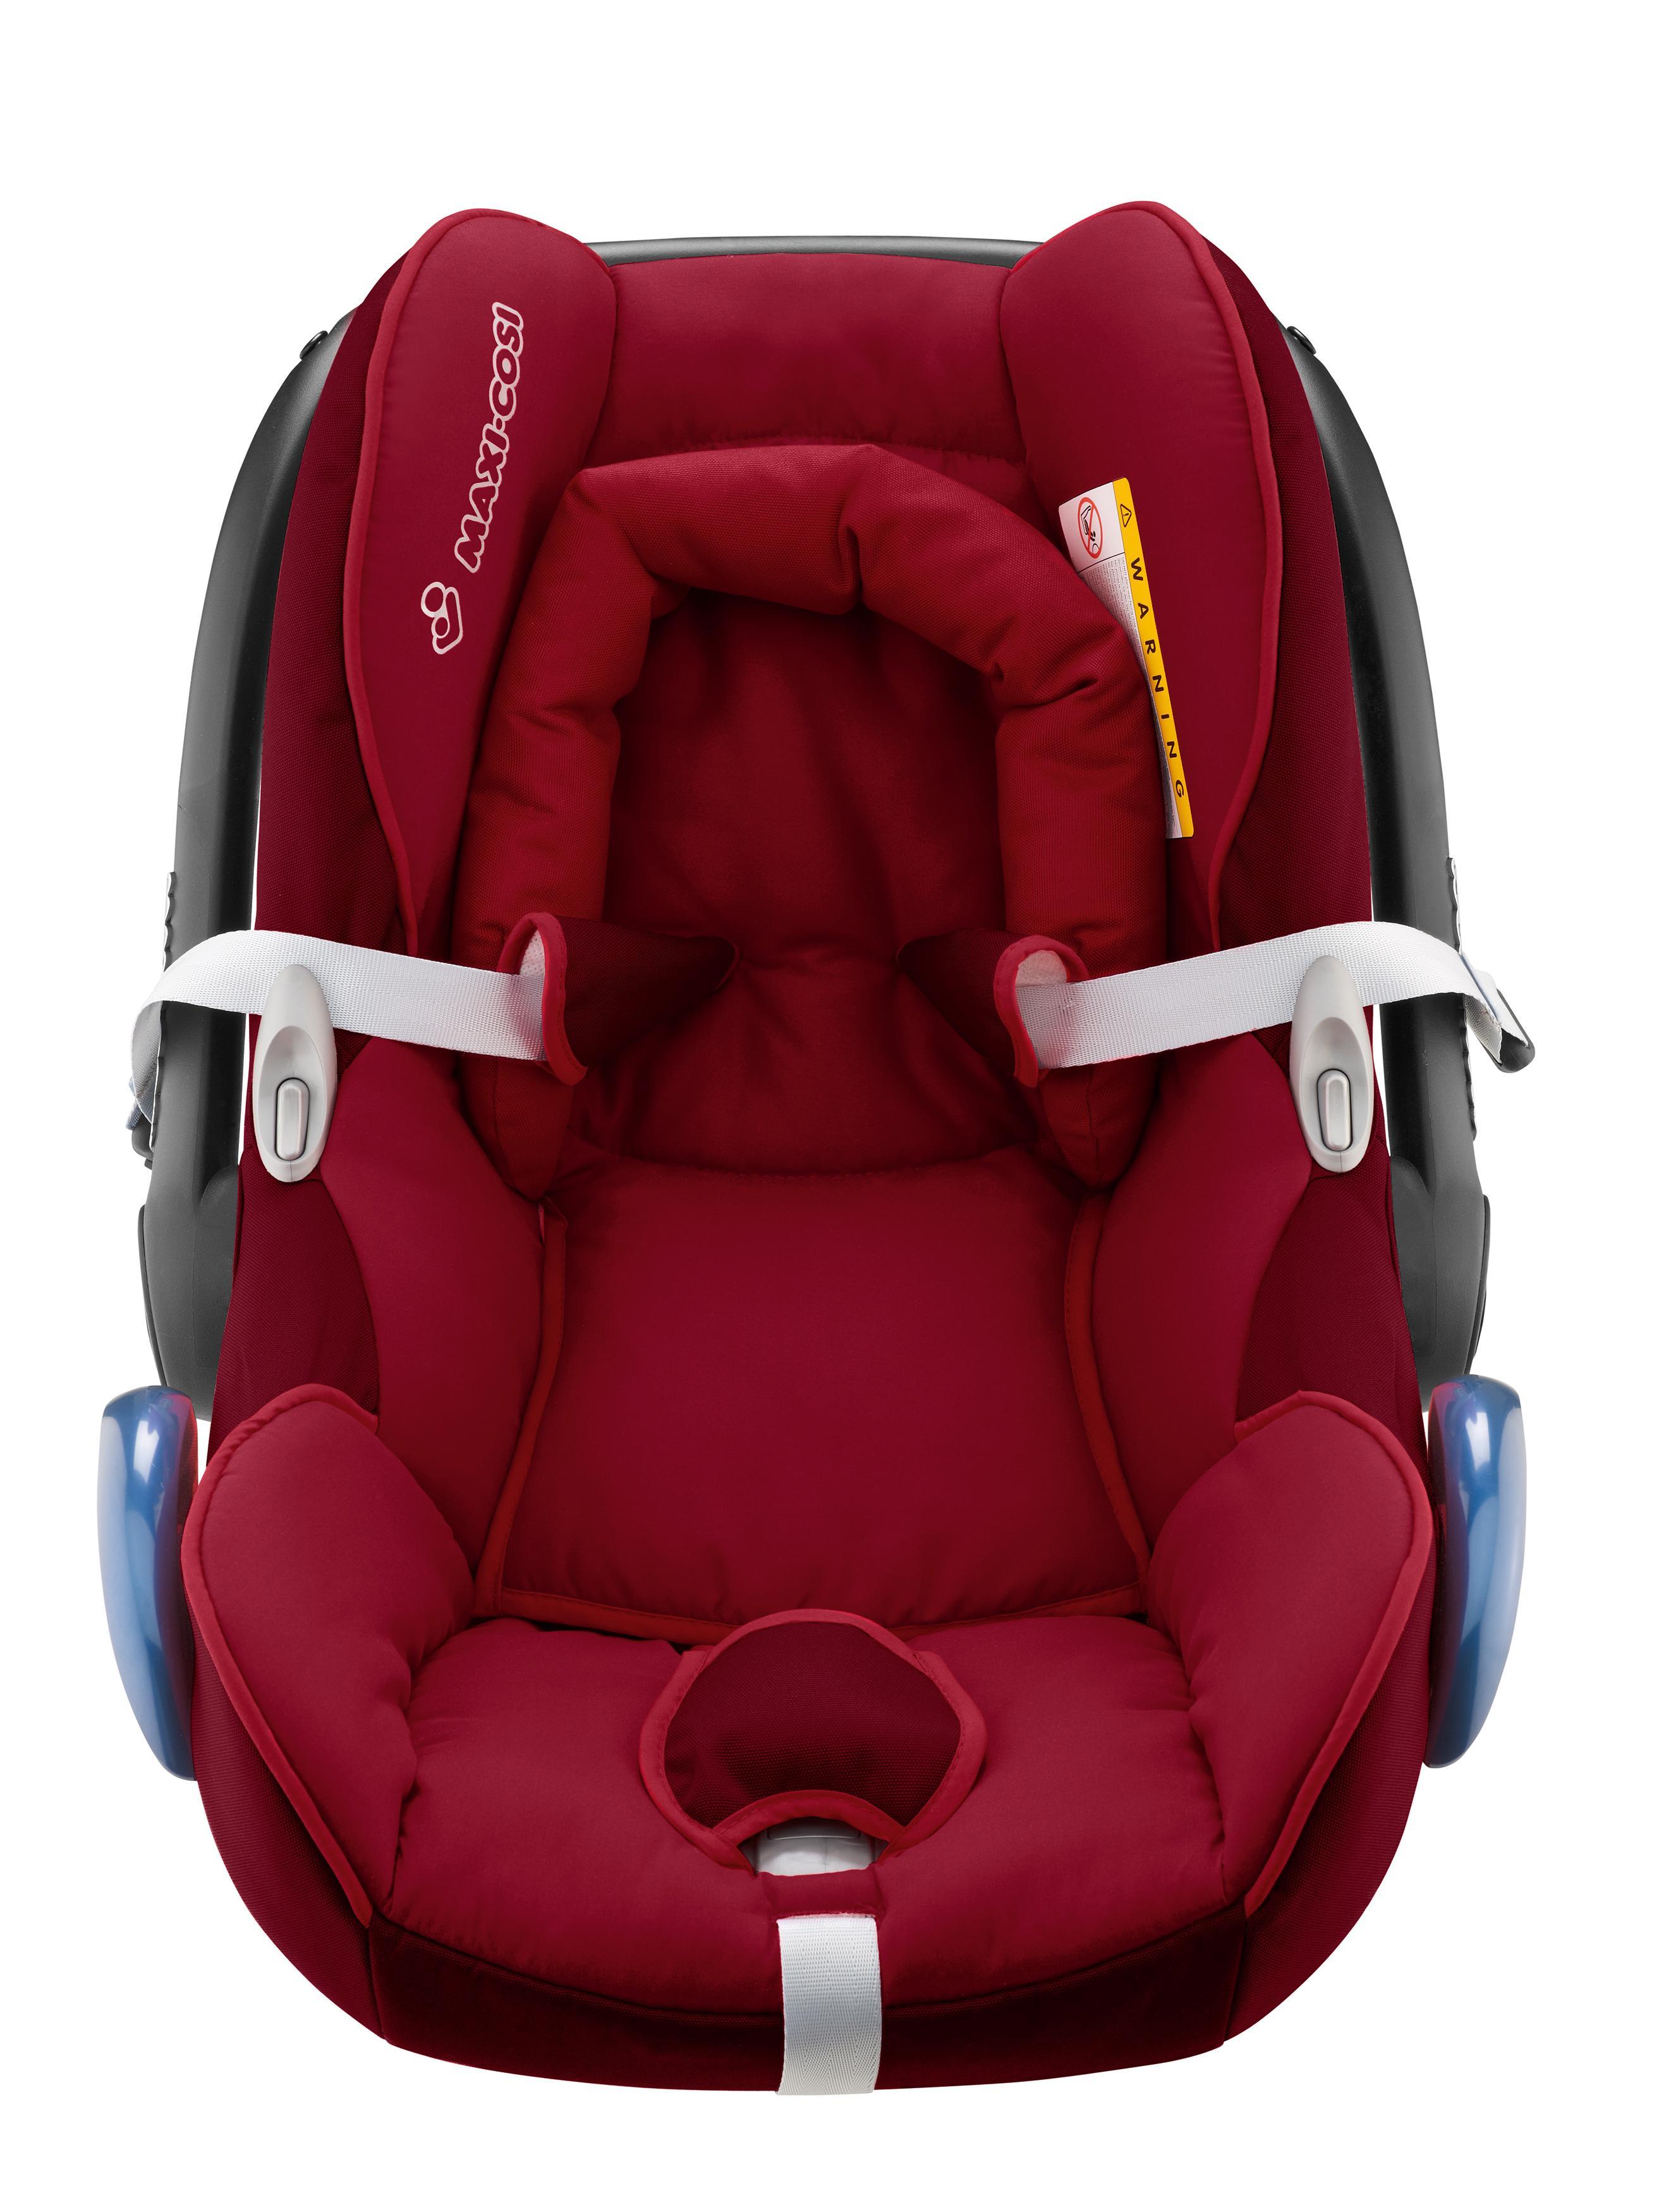 maxi cosi pearl car seat instruction manual filezebra. Black Bedroom Furniture Sets. Home Design Ideas